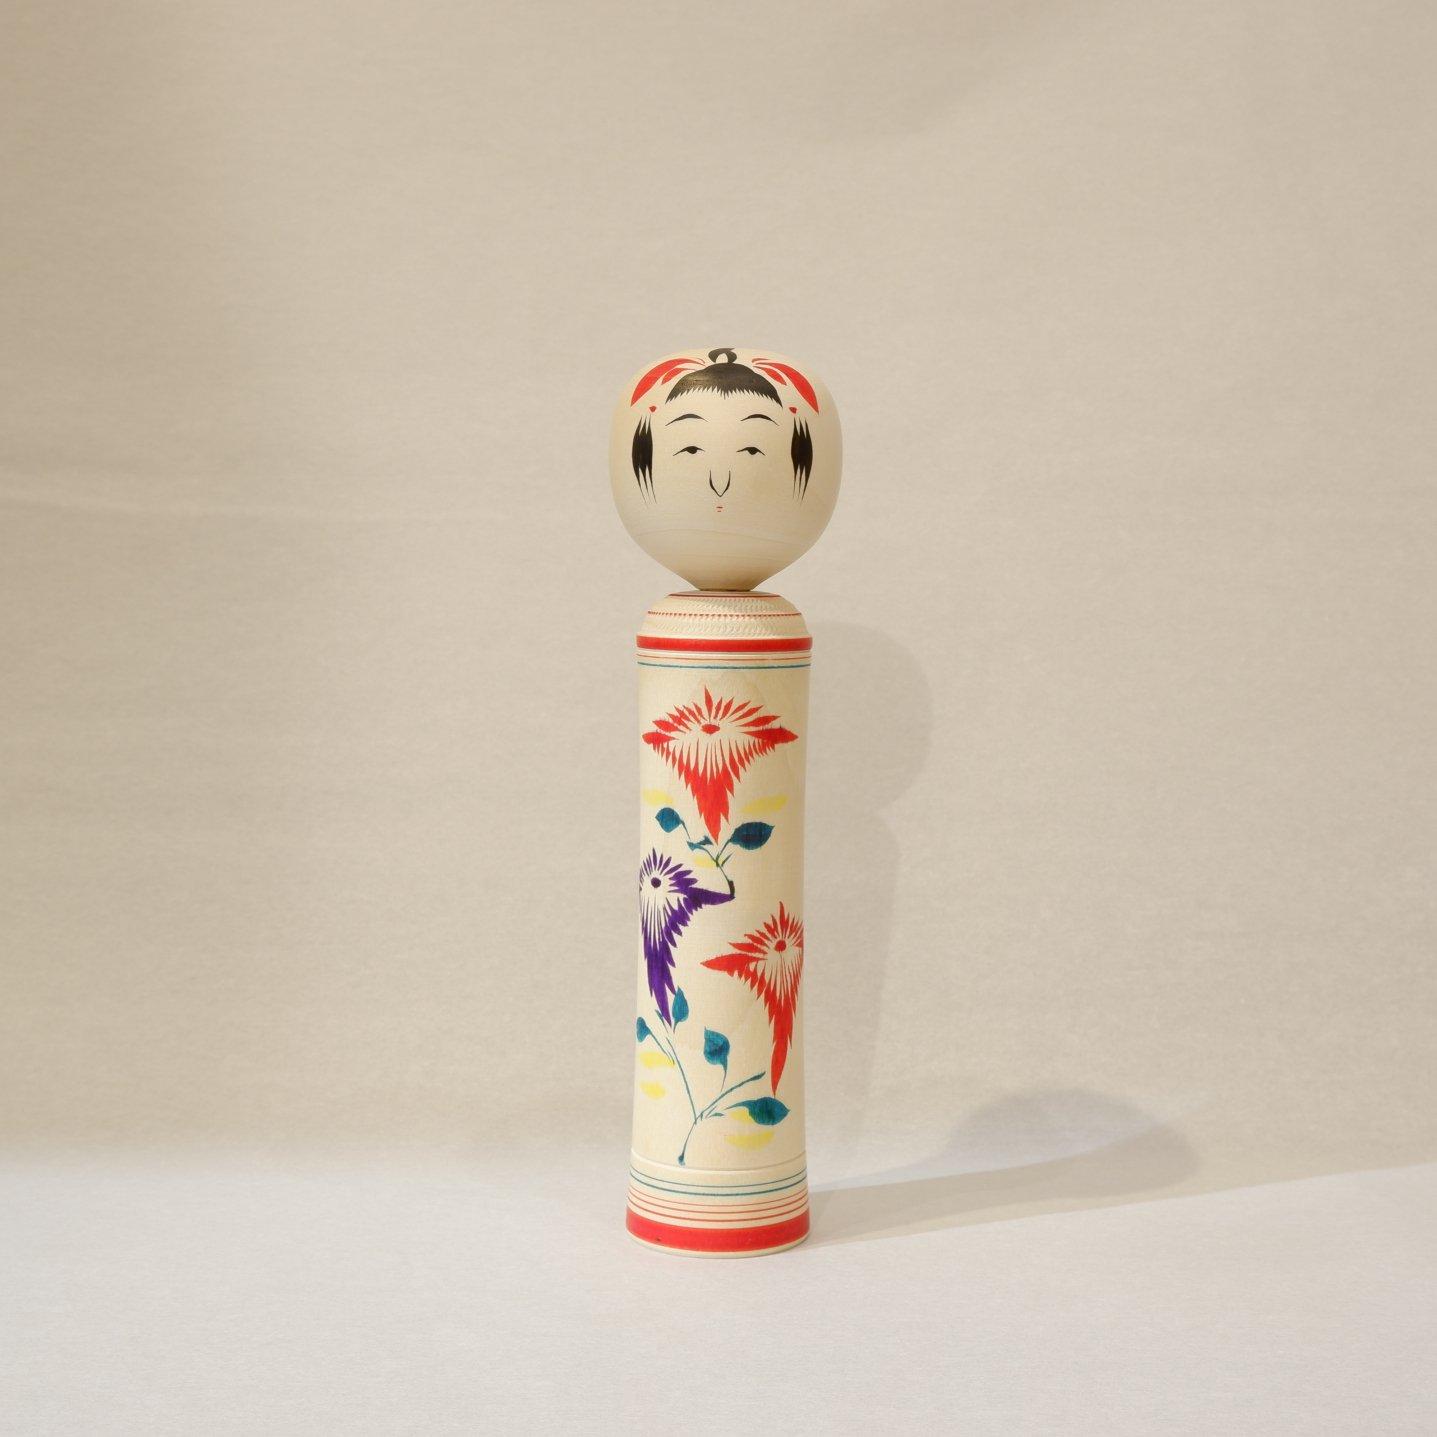 【New 5/10販売】高橋五郎コレクション〈岩蔵型ビリガンナ6寸6分a〉